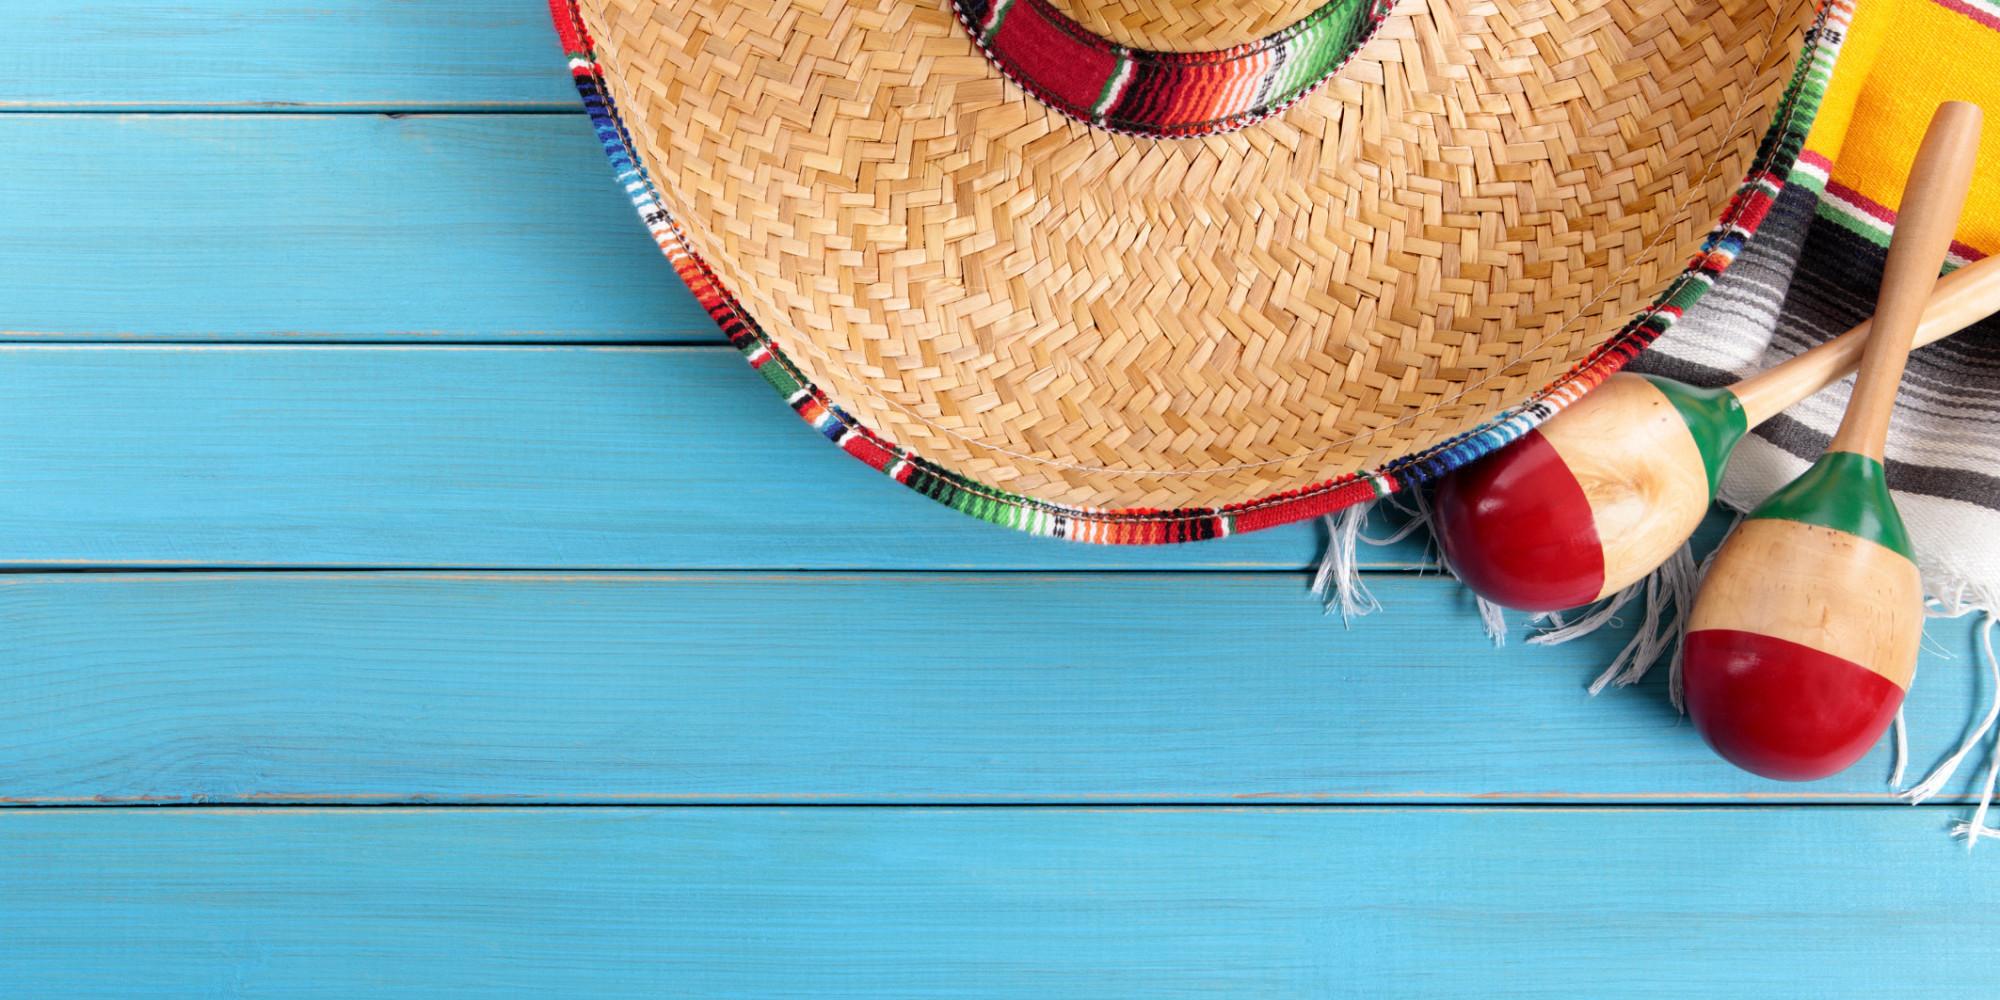 How to Celebrate Cinco de Mayo Like a True Mexican | HuffPost